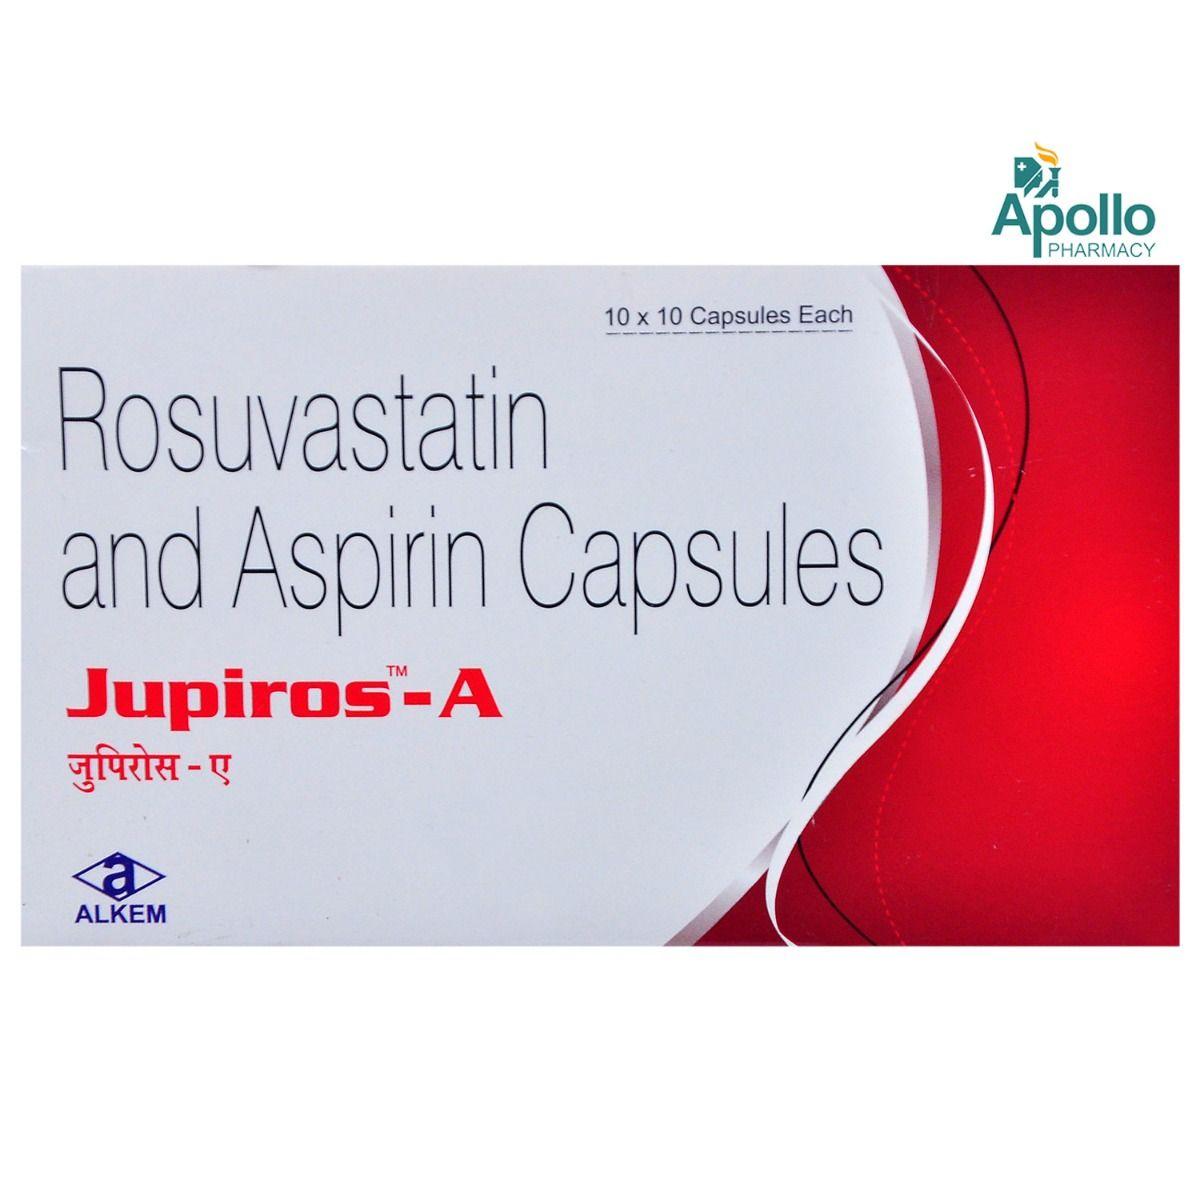 Jupiros-A Capsule 10's